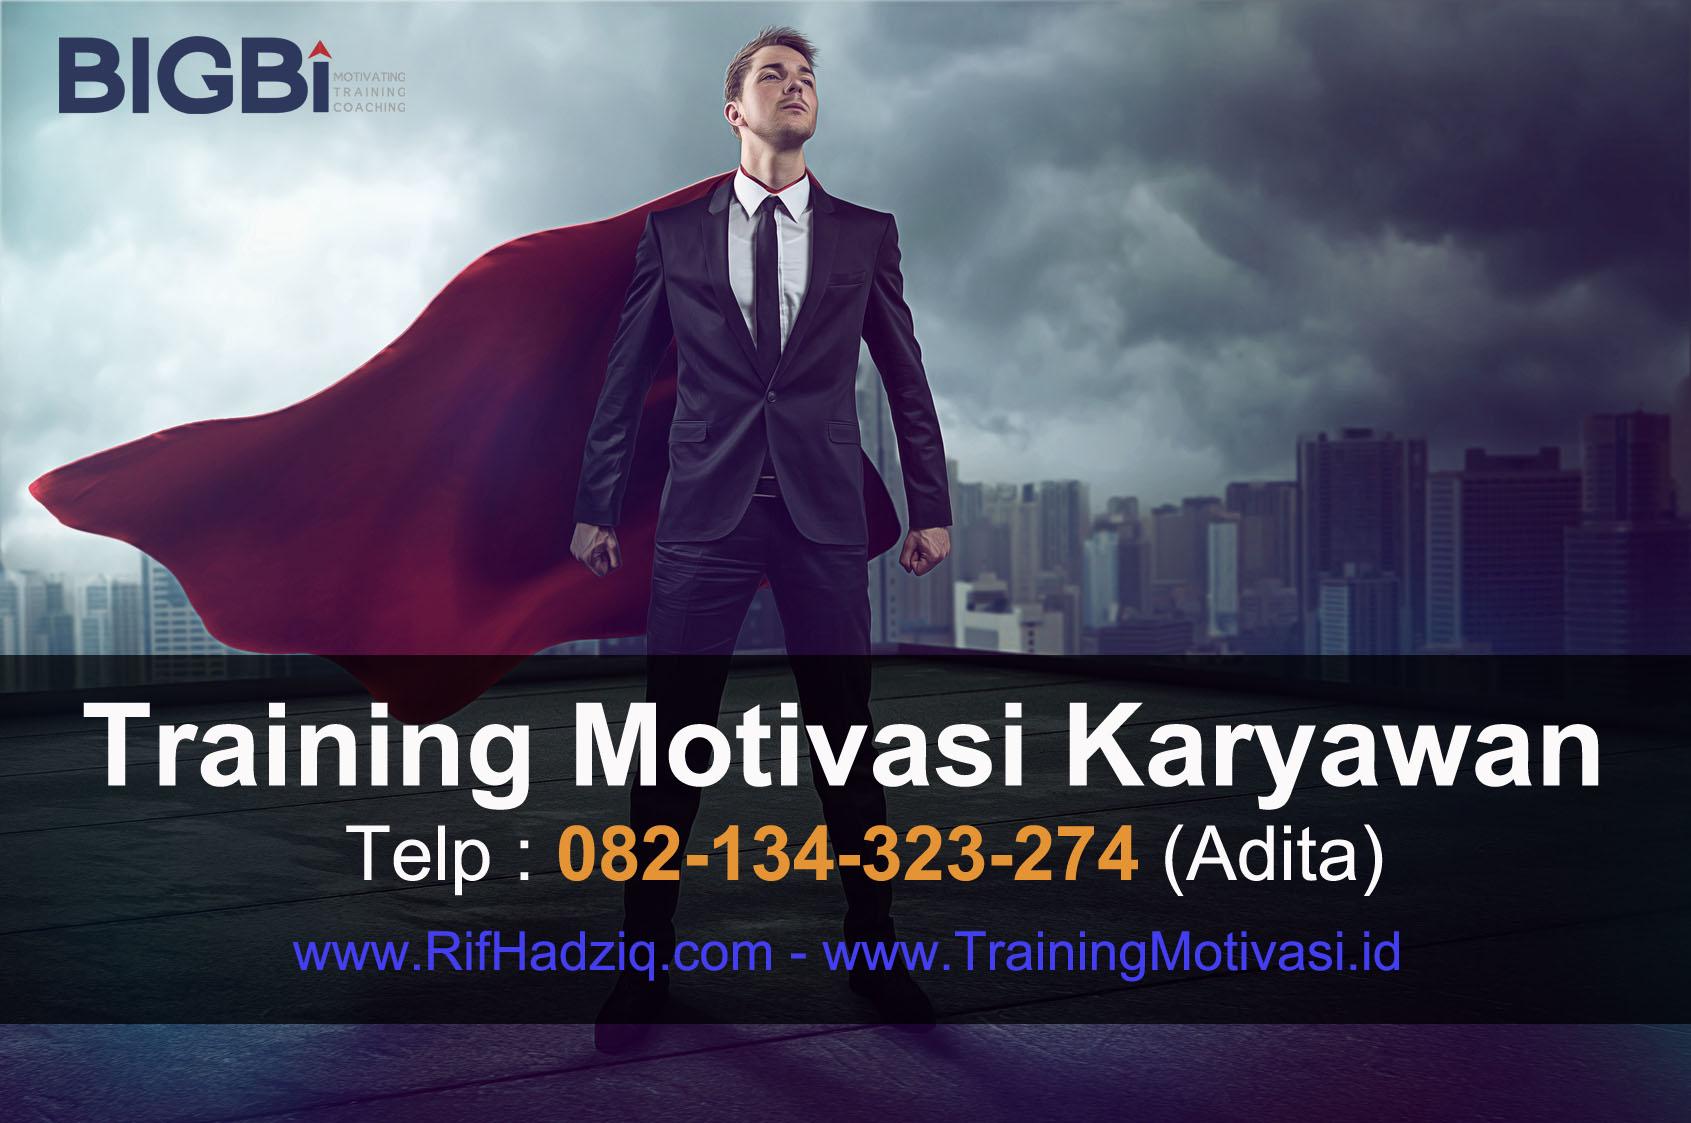 Motivator Indonesia, motivator perusahaan, rif hadziq, motivasi